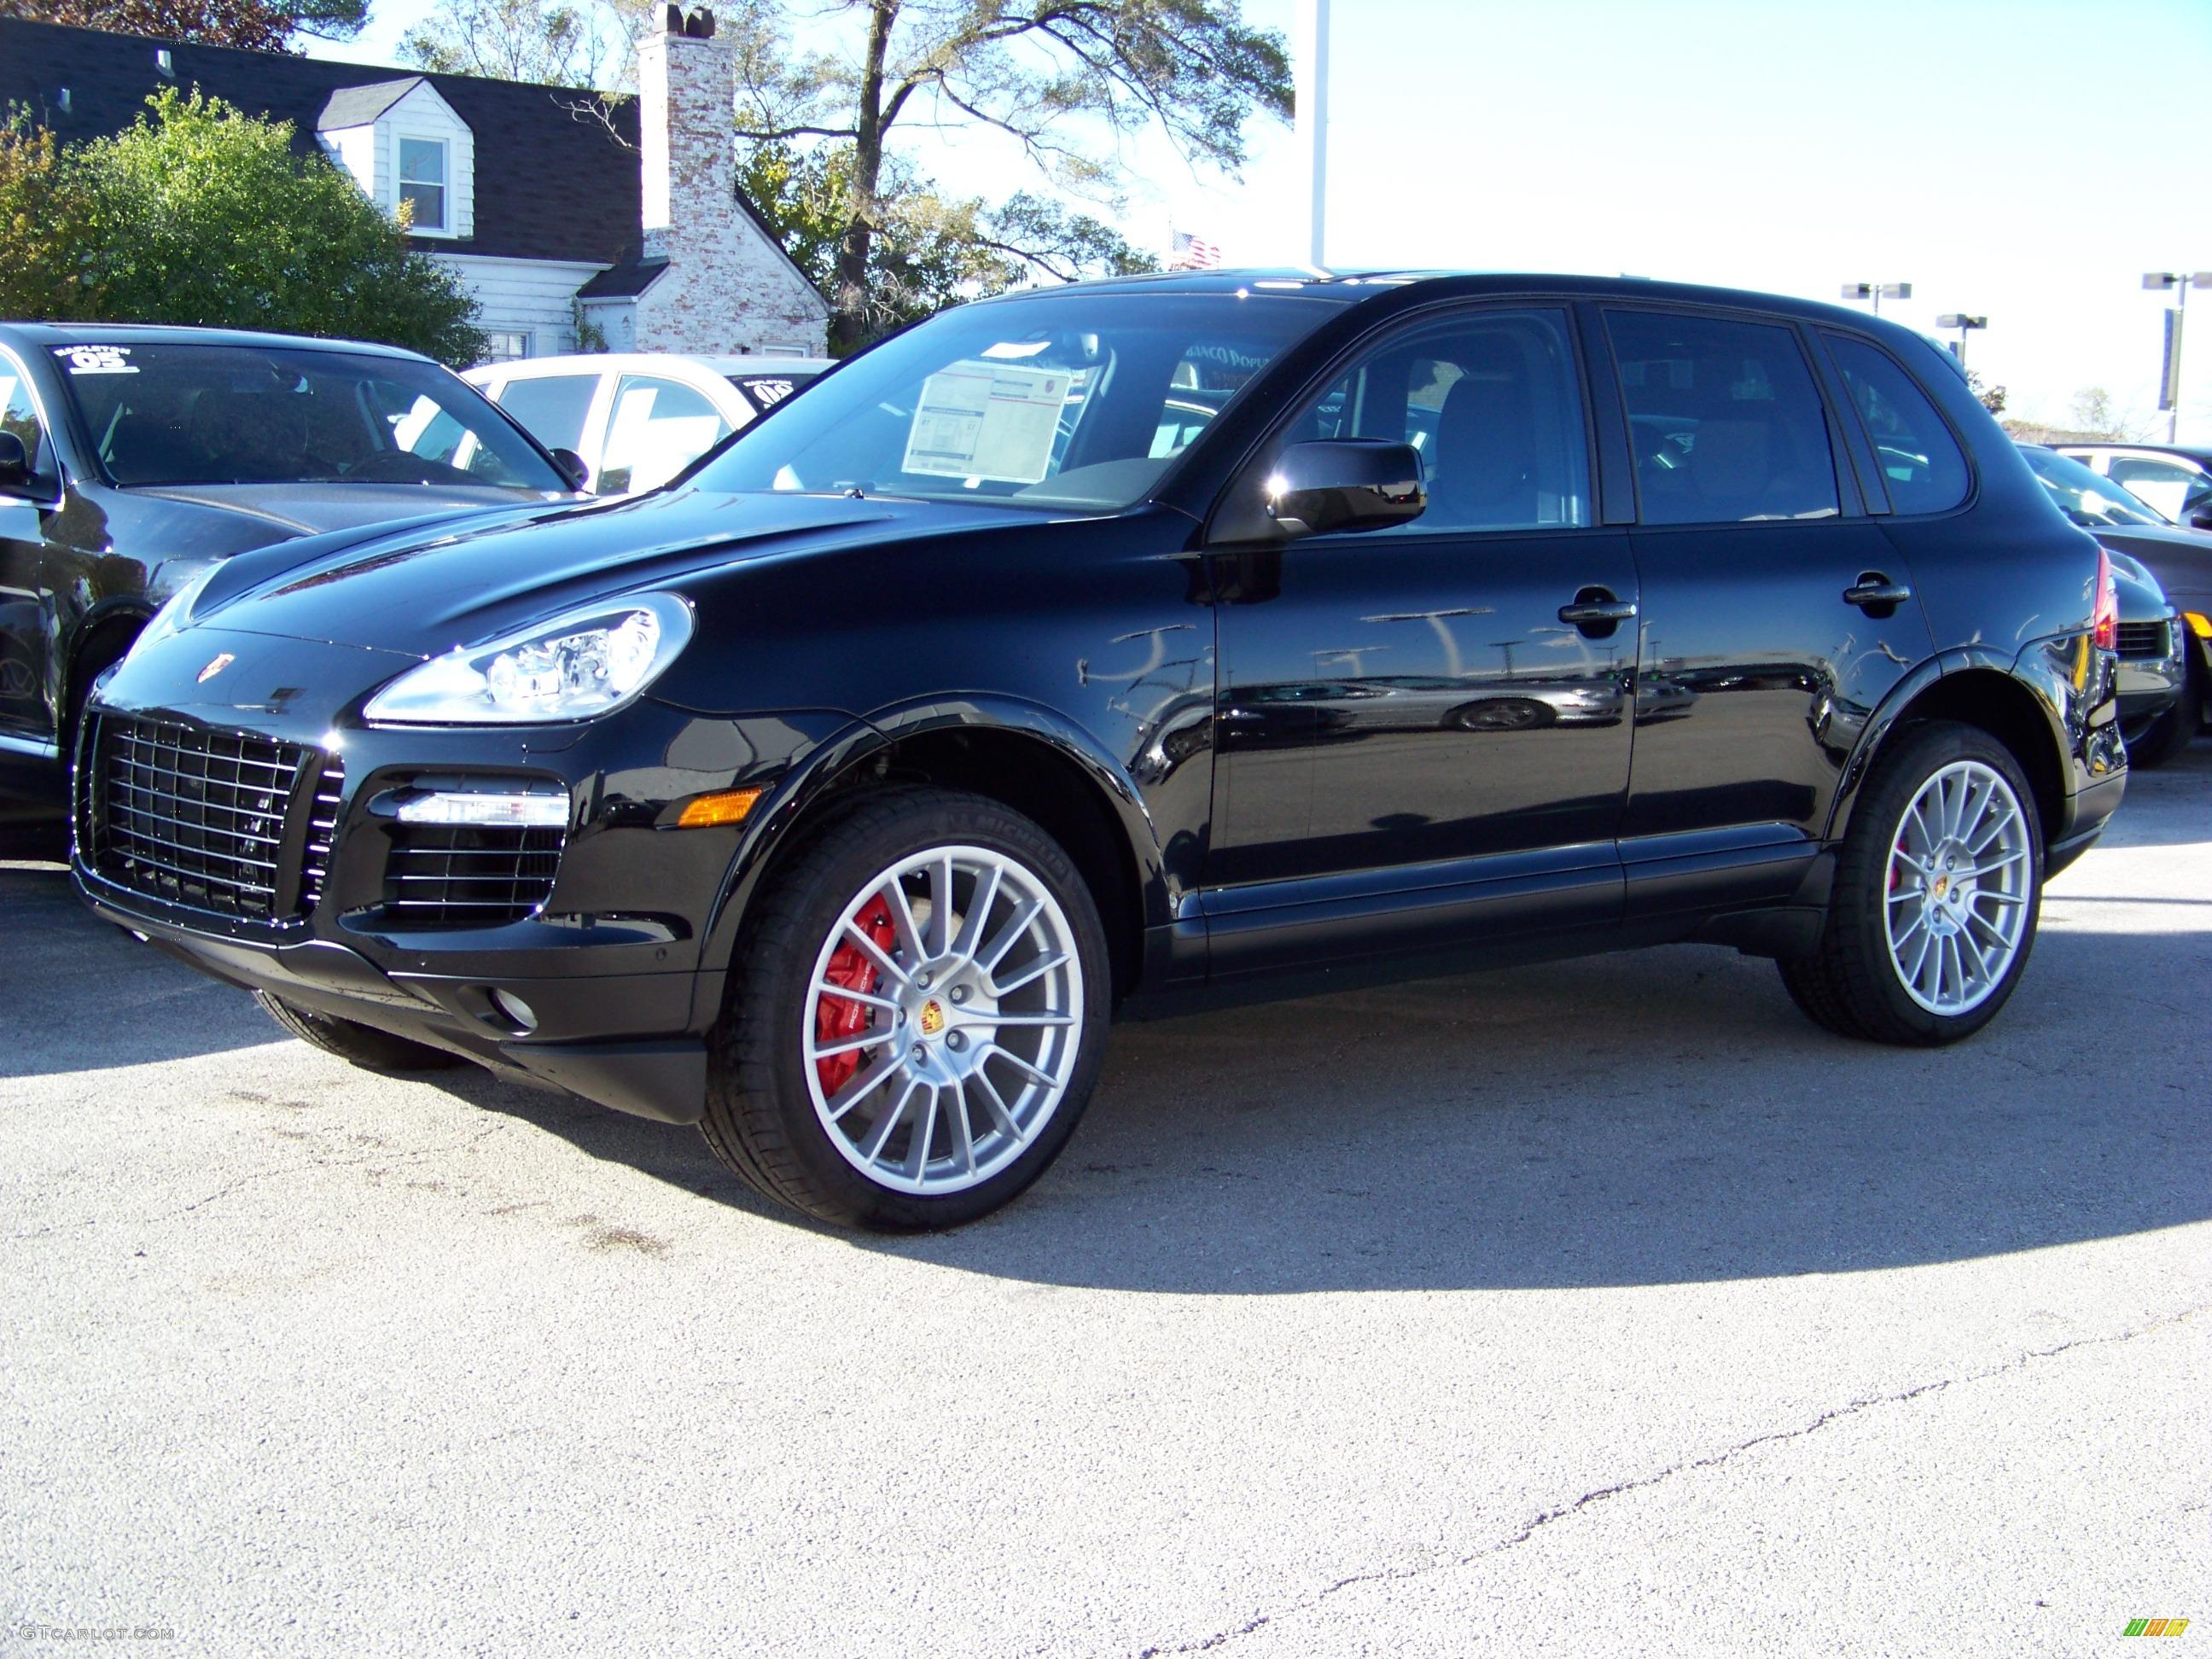 2009 Black Porsche Cayenne Turbo S #348419 | GTCarLot.com - Car ...